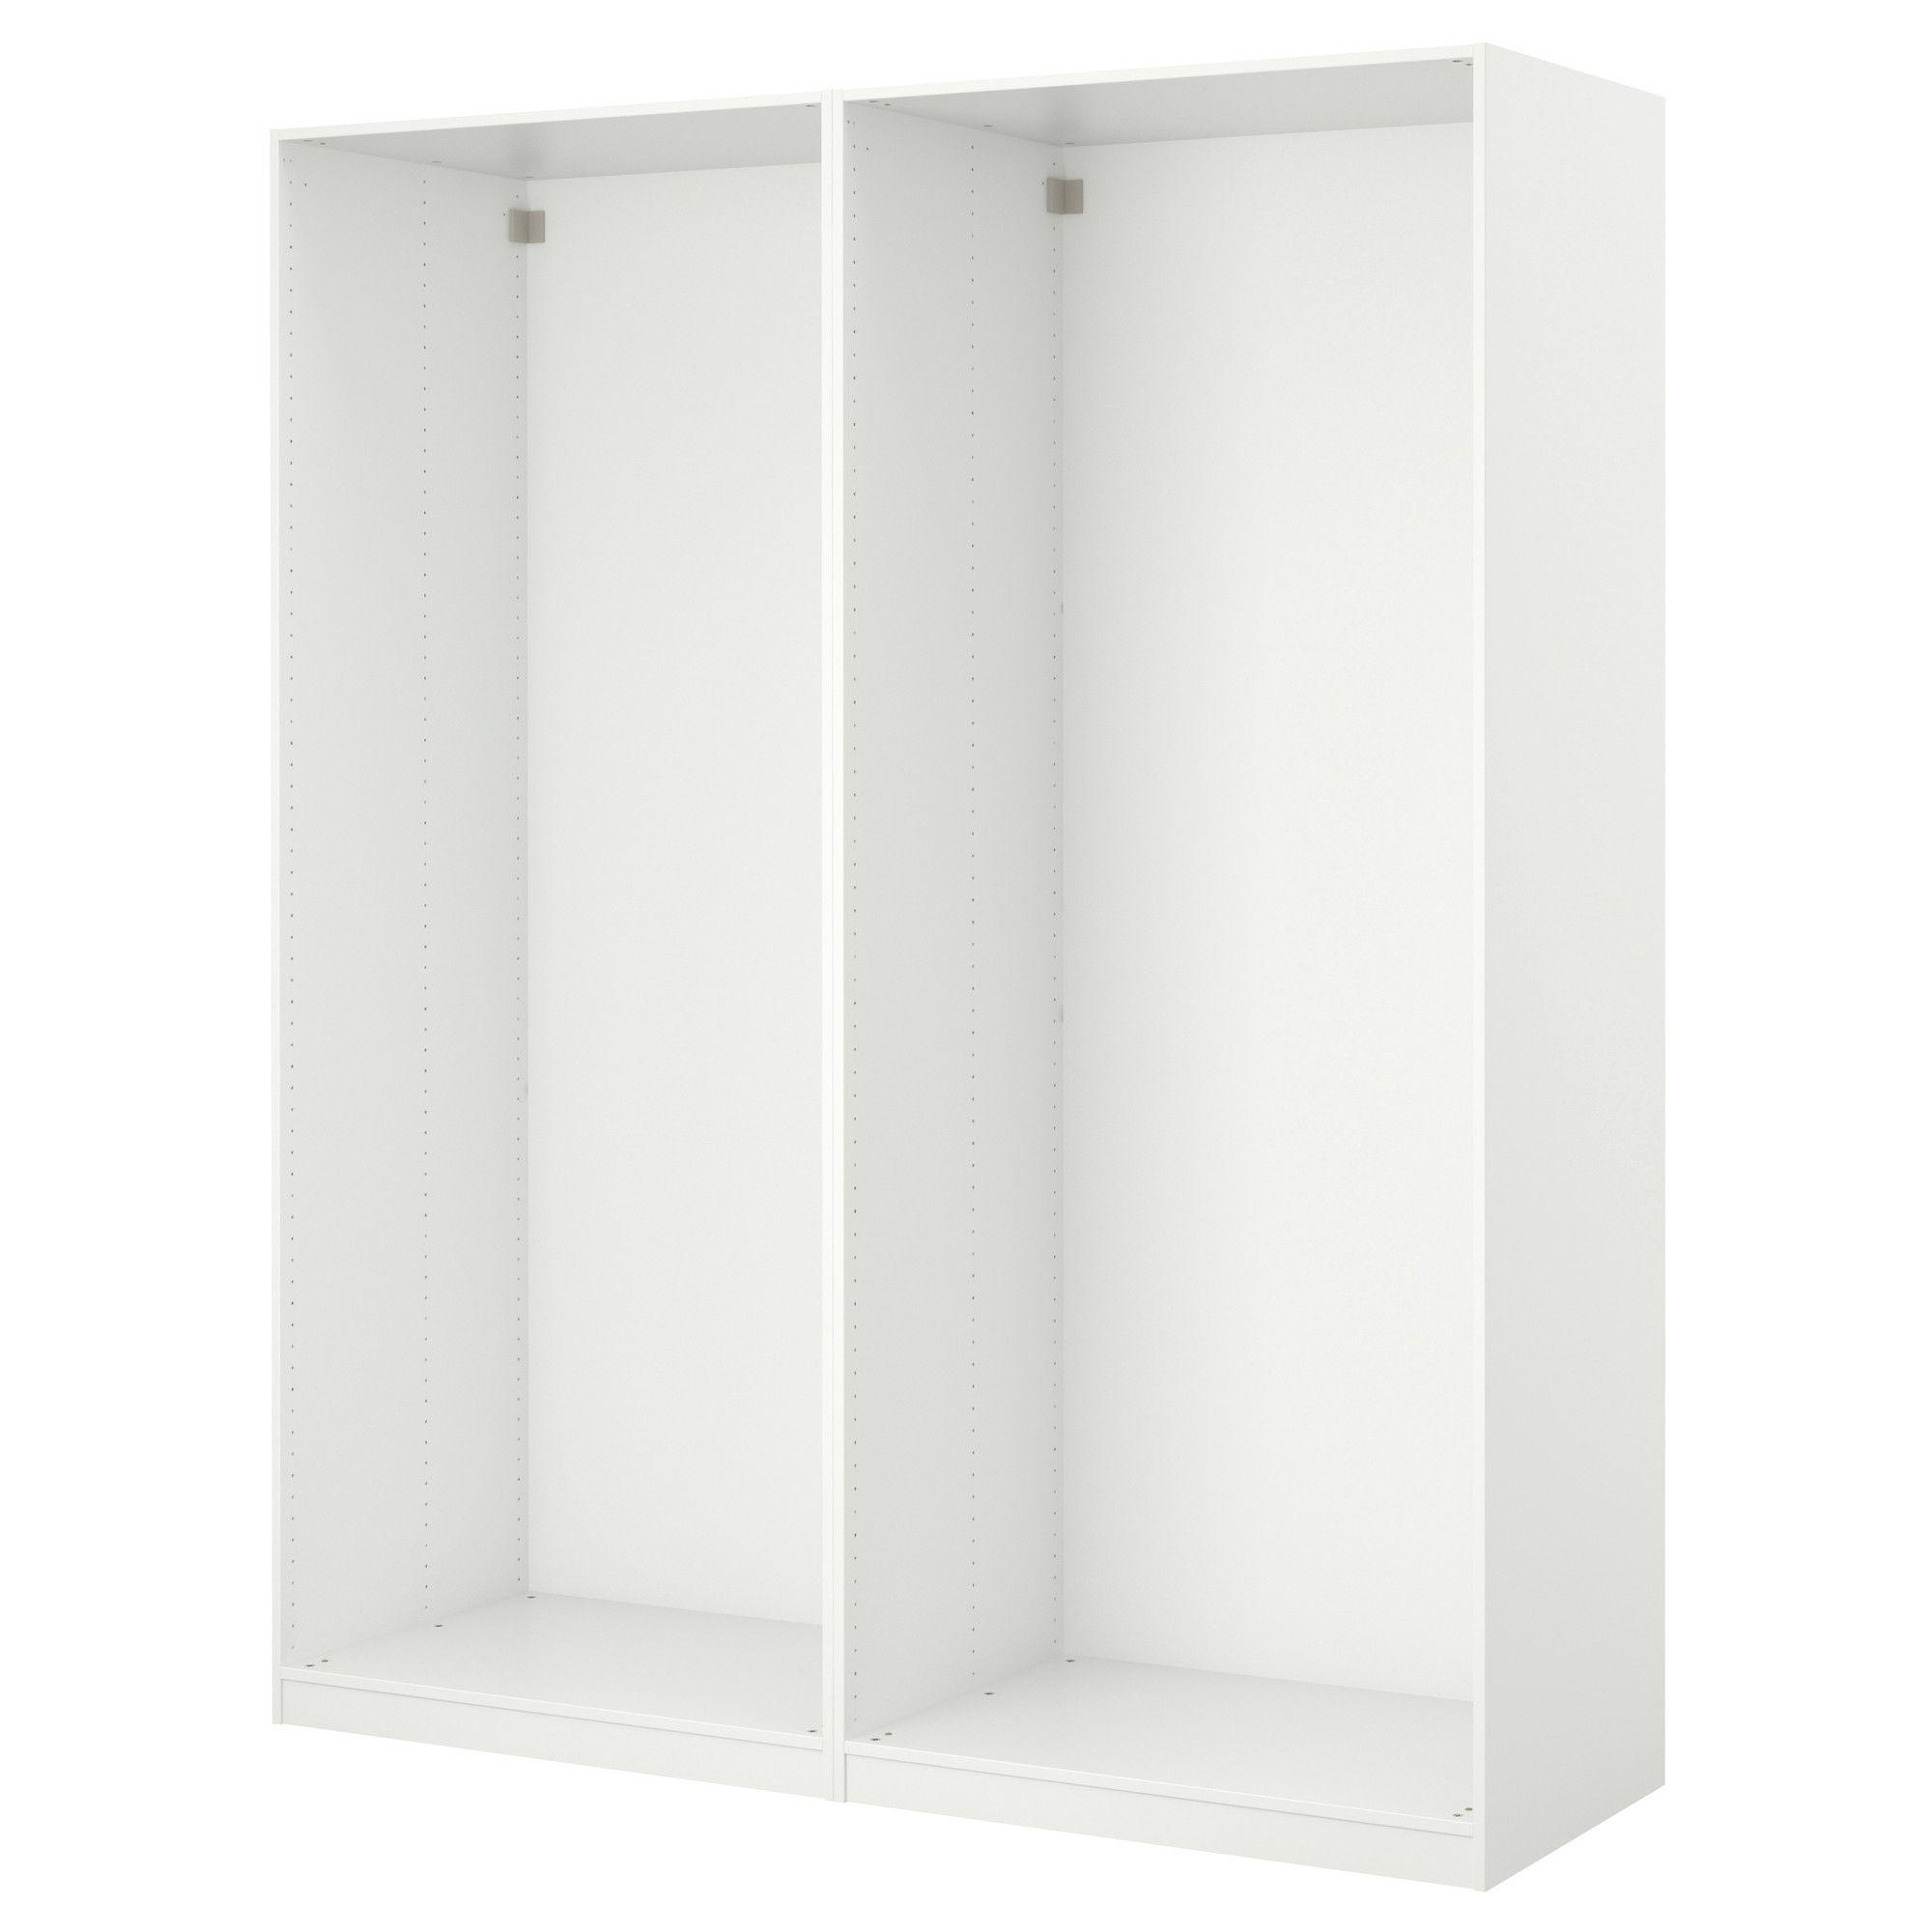 Aneboda Garderobekast Wit.Pax 2 Basiselementen Kledingkast Wit Closet Pax Closet Pax